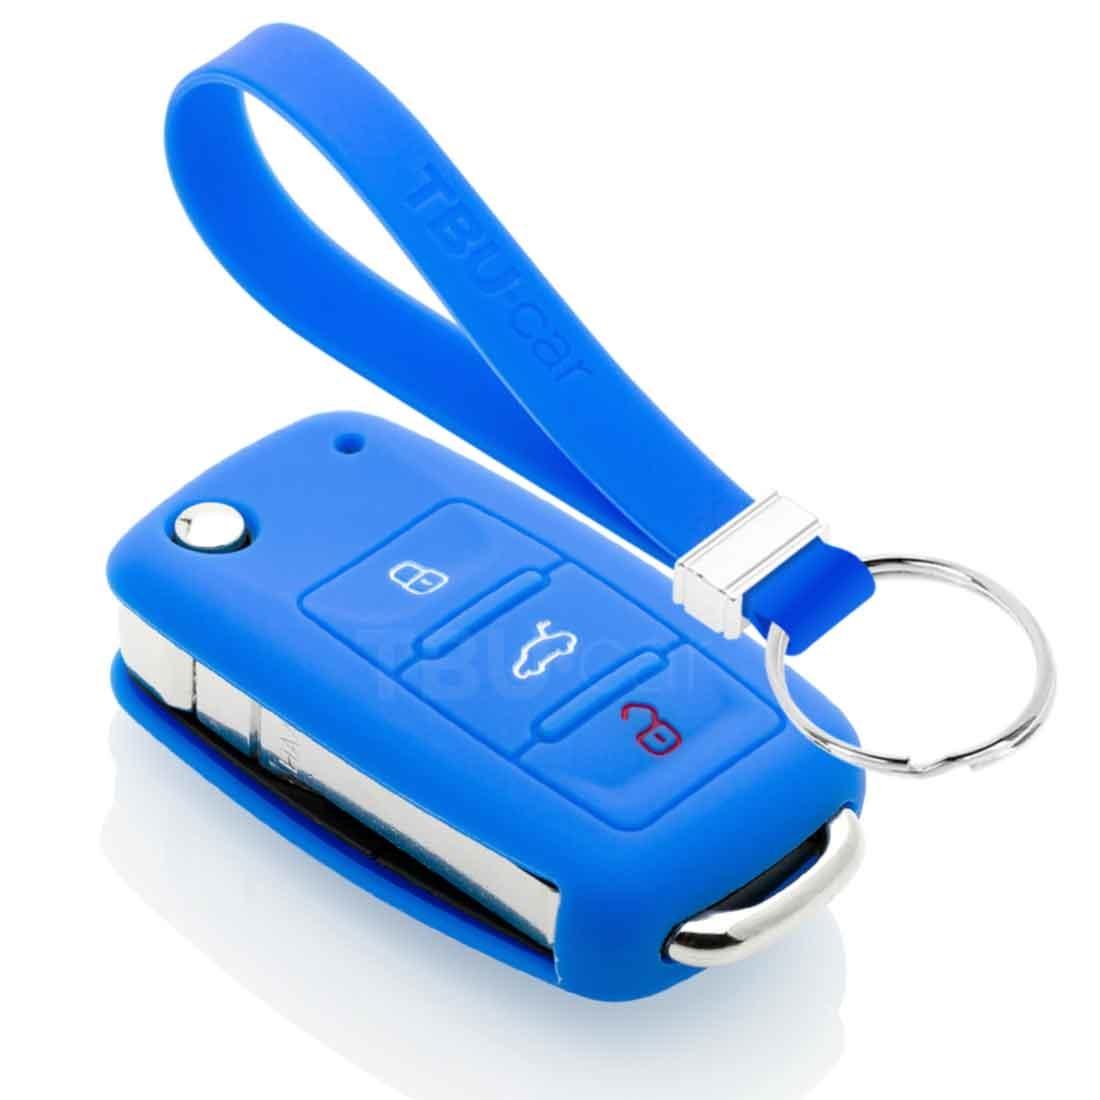 TBU car TBU car Autoschlüssel Hülle kompatibel mit Audi 3 Tasten - Schutzhülle aus Silikon - Auto Schlüsselhülle Cover in Blau